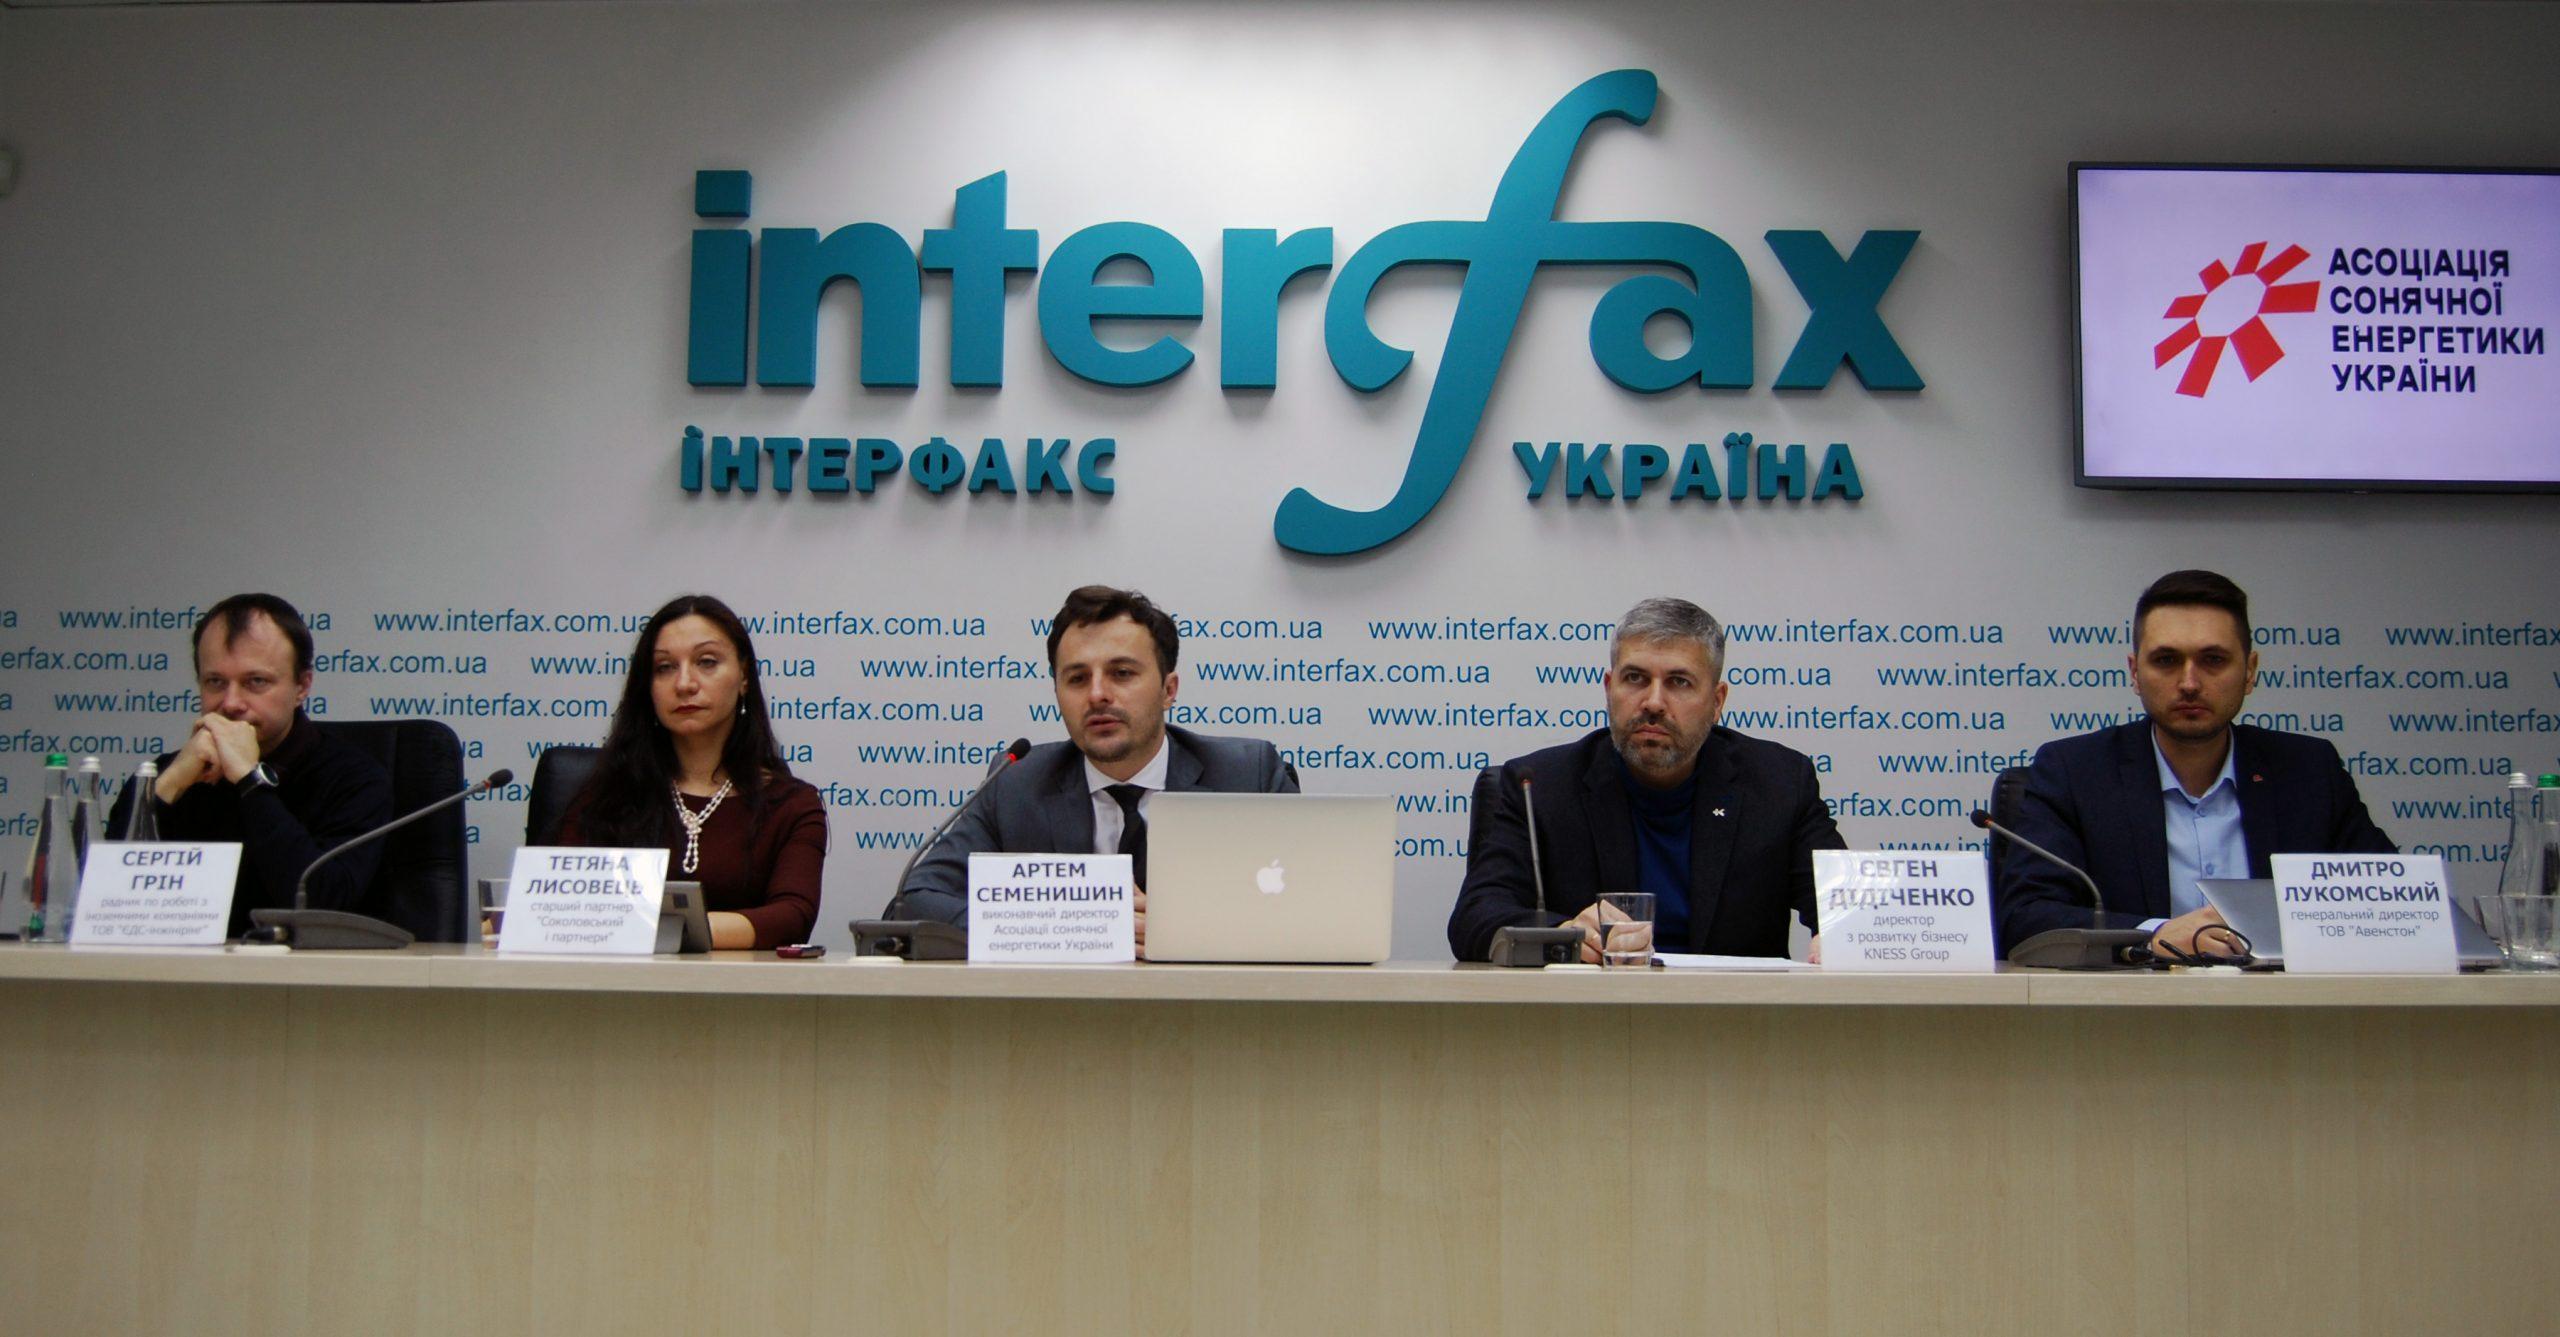 Representatives of the Solar Energy Association of Ukraine